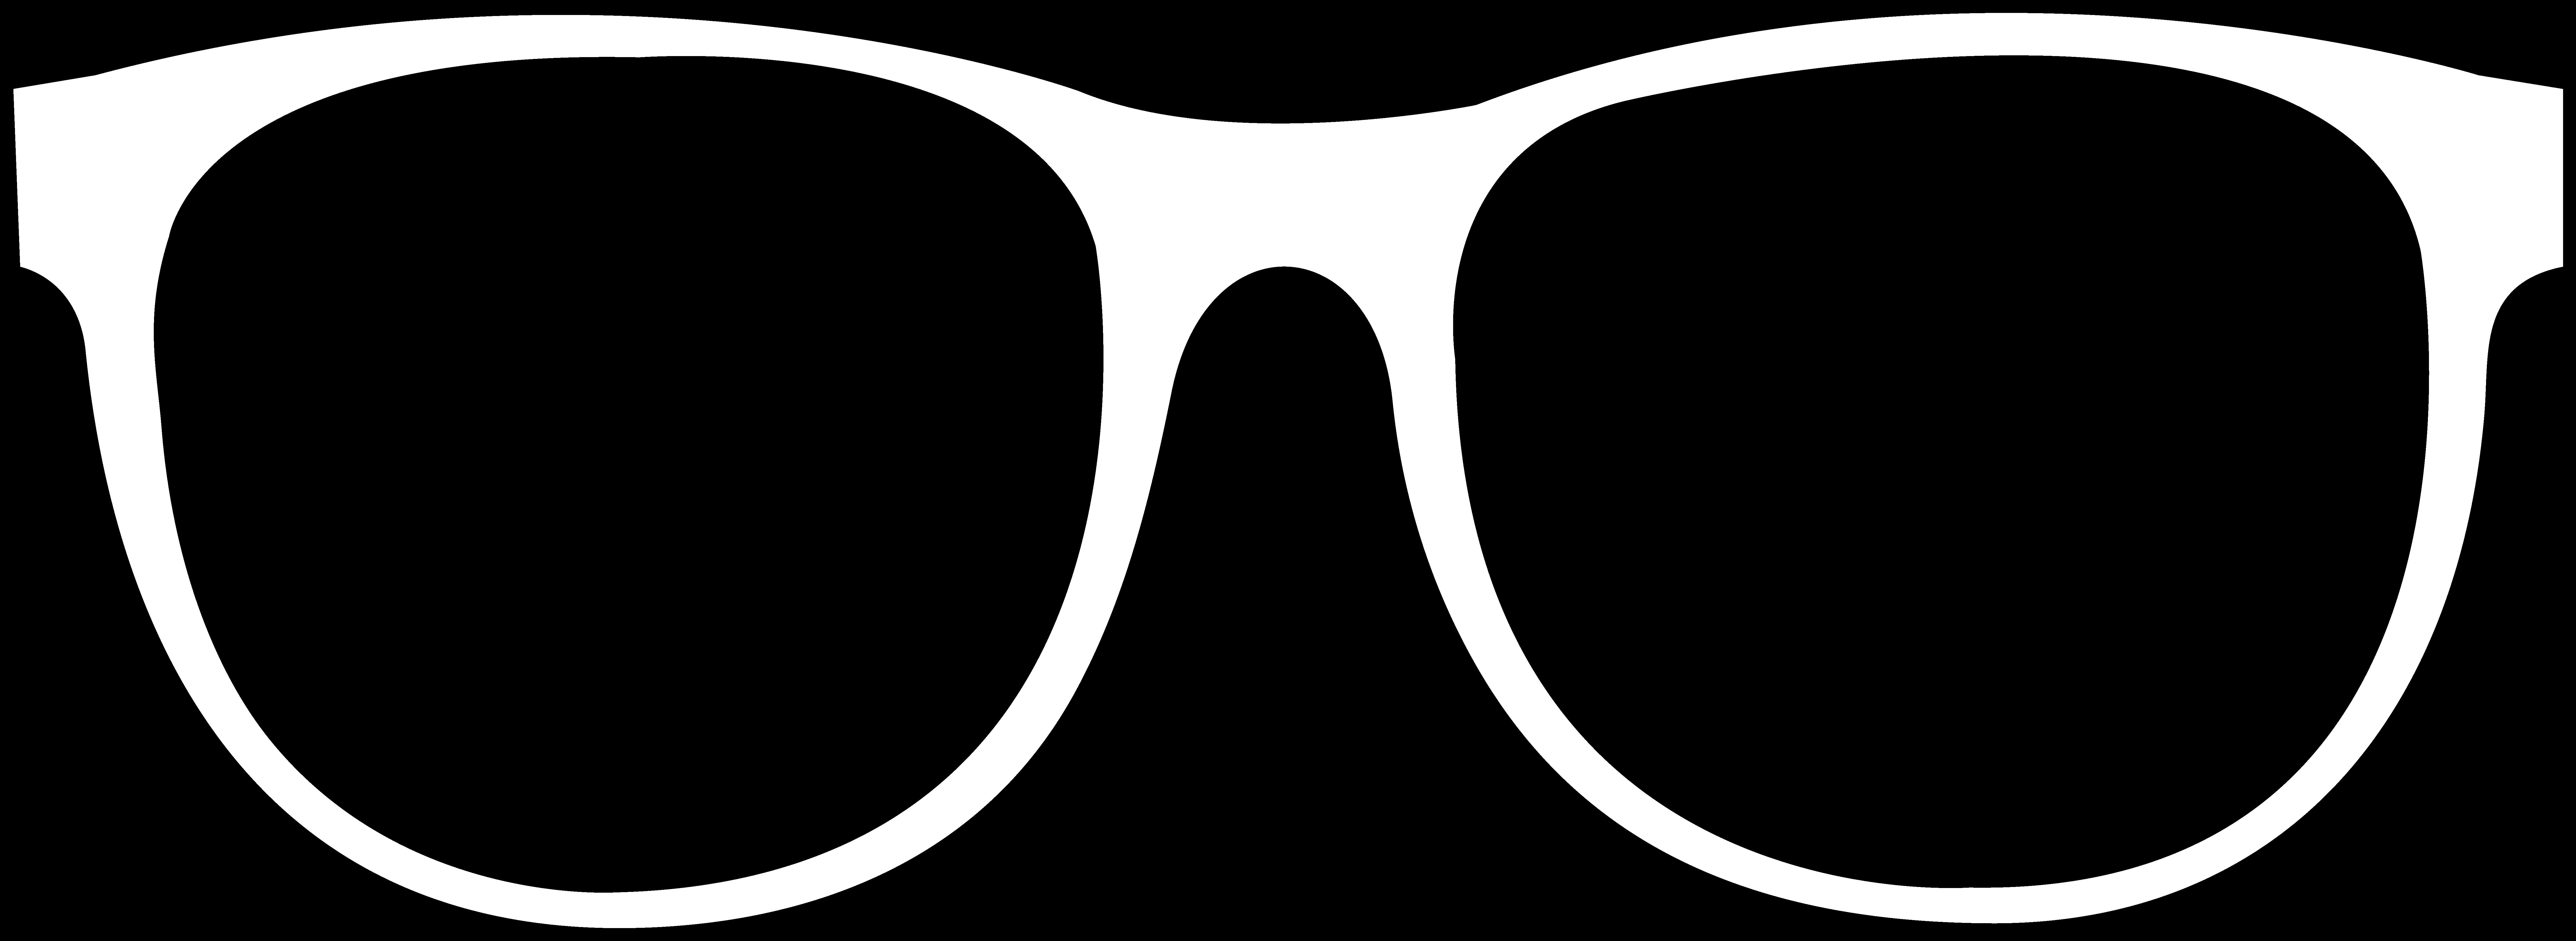 Cat eye glasses clipart clip transparent Summer Glasses Cliparts - Cliparts Zone clip transparent